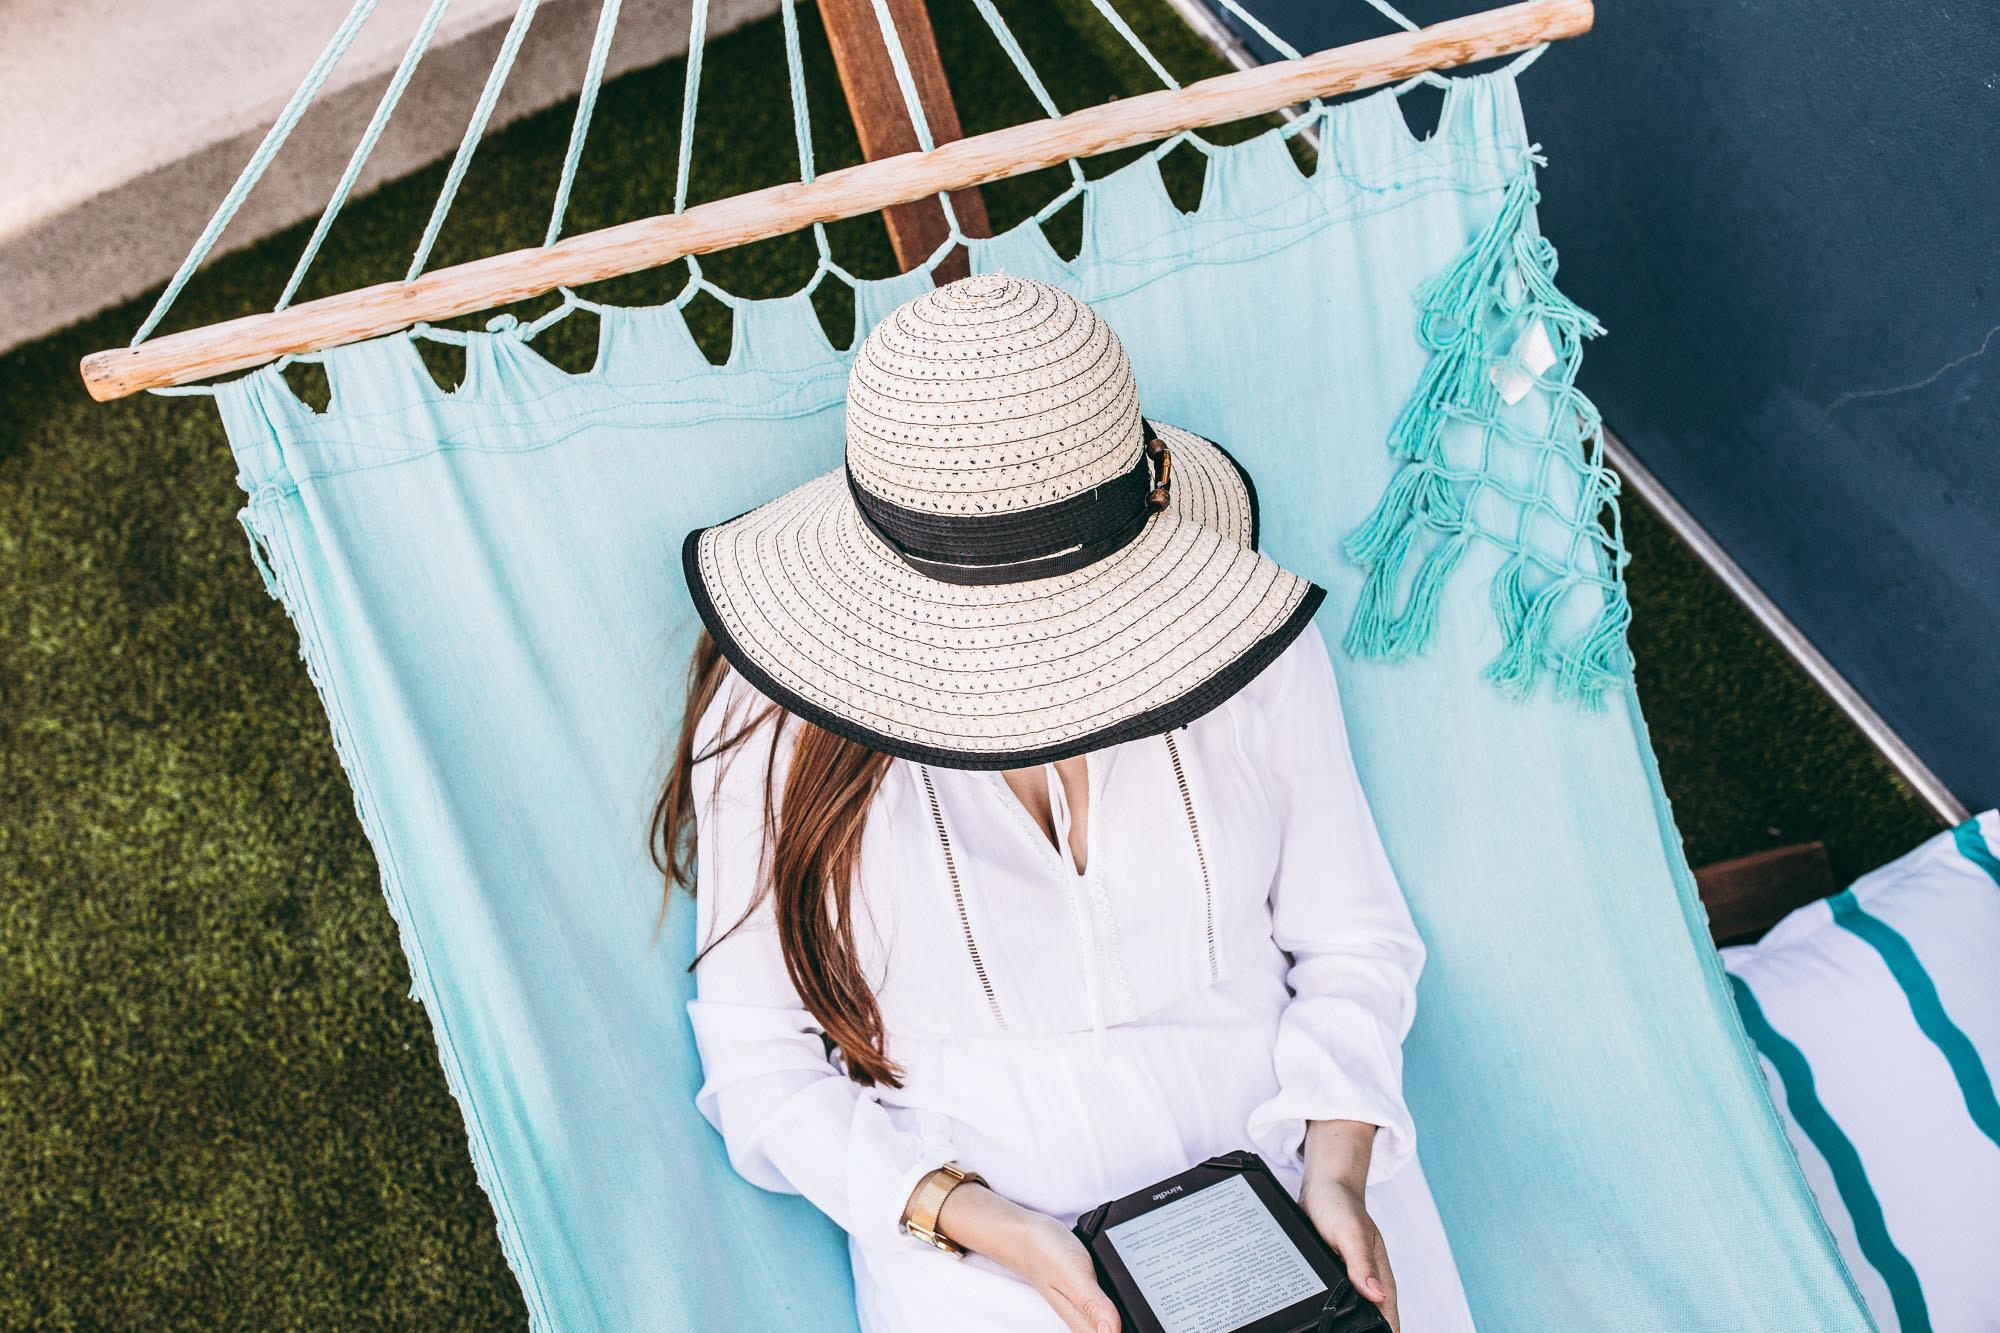 fotografo-bodas-las-palmas-carlosglez-unbuenmomento-hotel-acuario-lifestyle-21